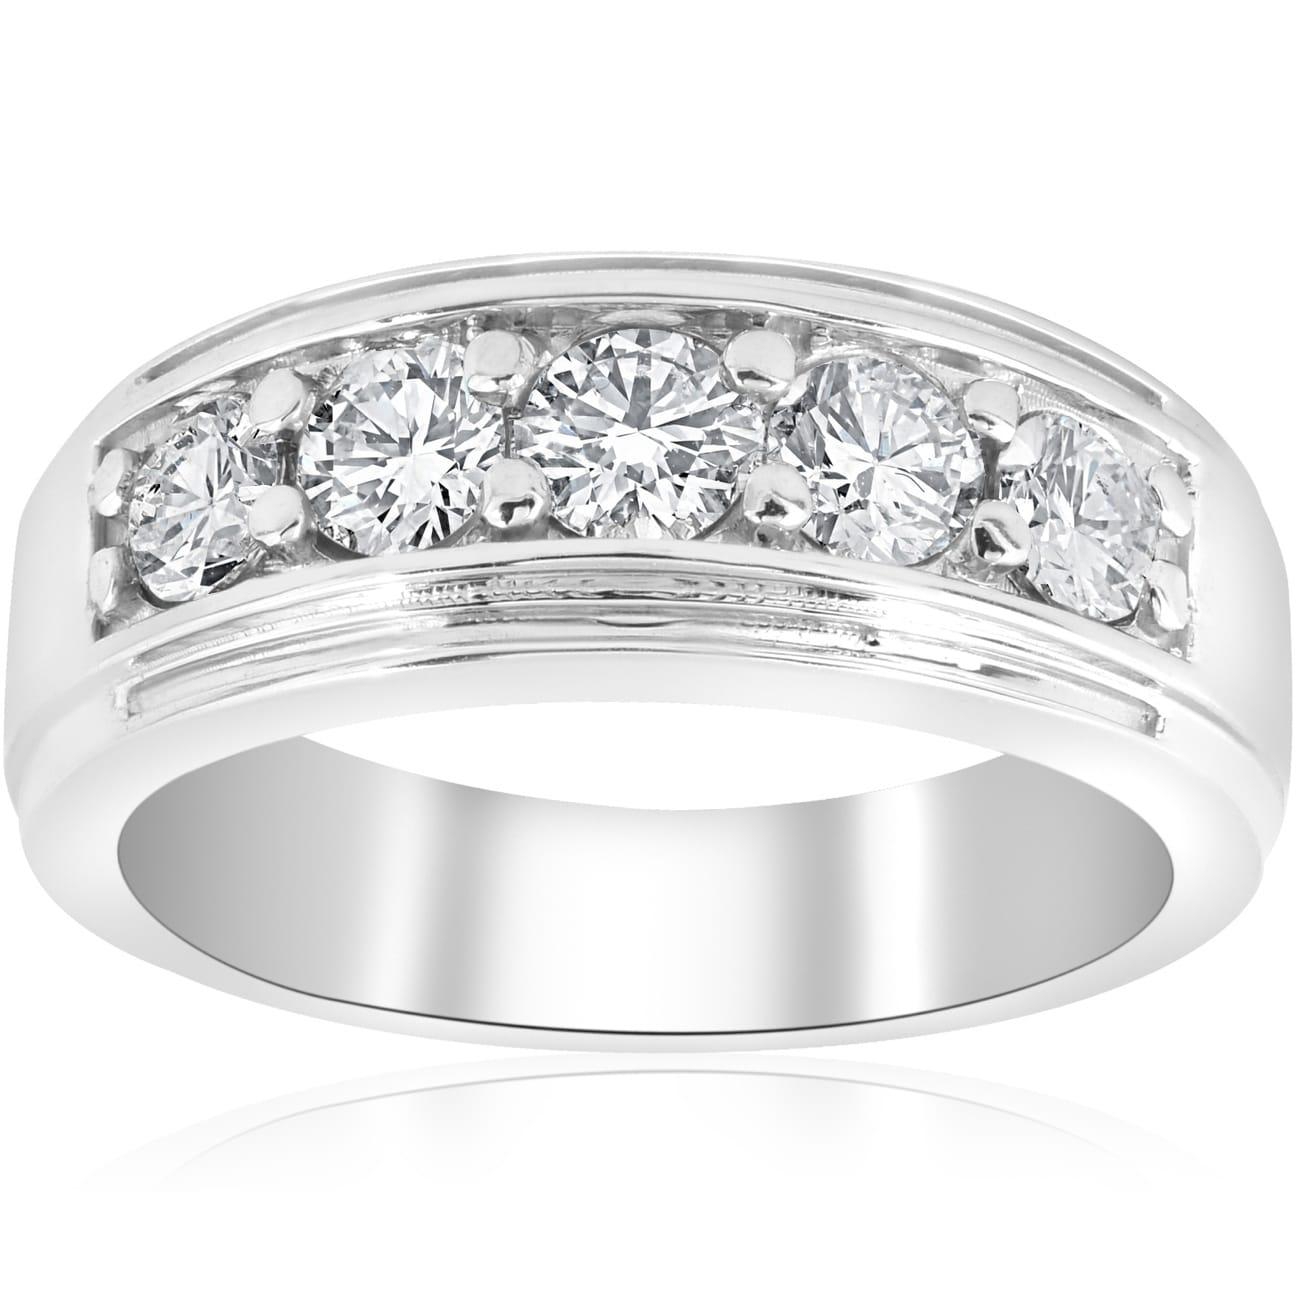 Shop Pompeii3 Platinum 1 Ct Tdw Mens Diamond Wedding Ring Band